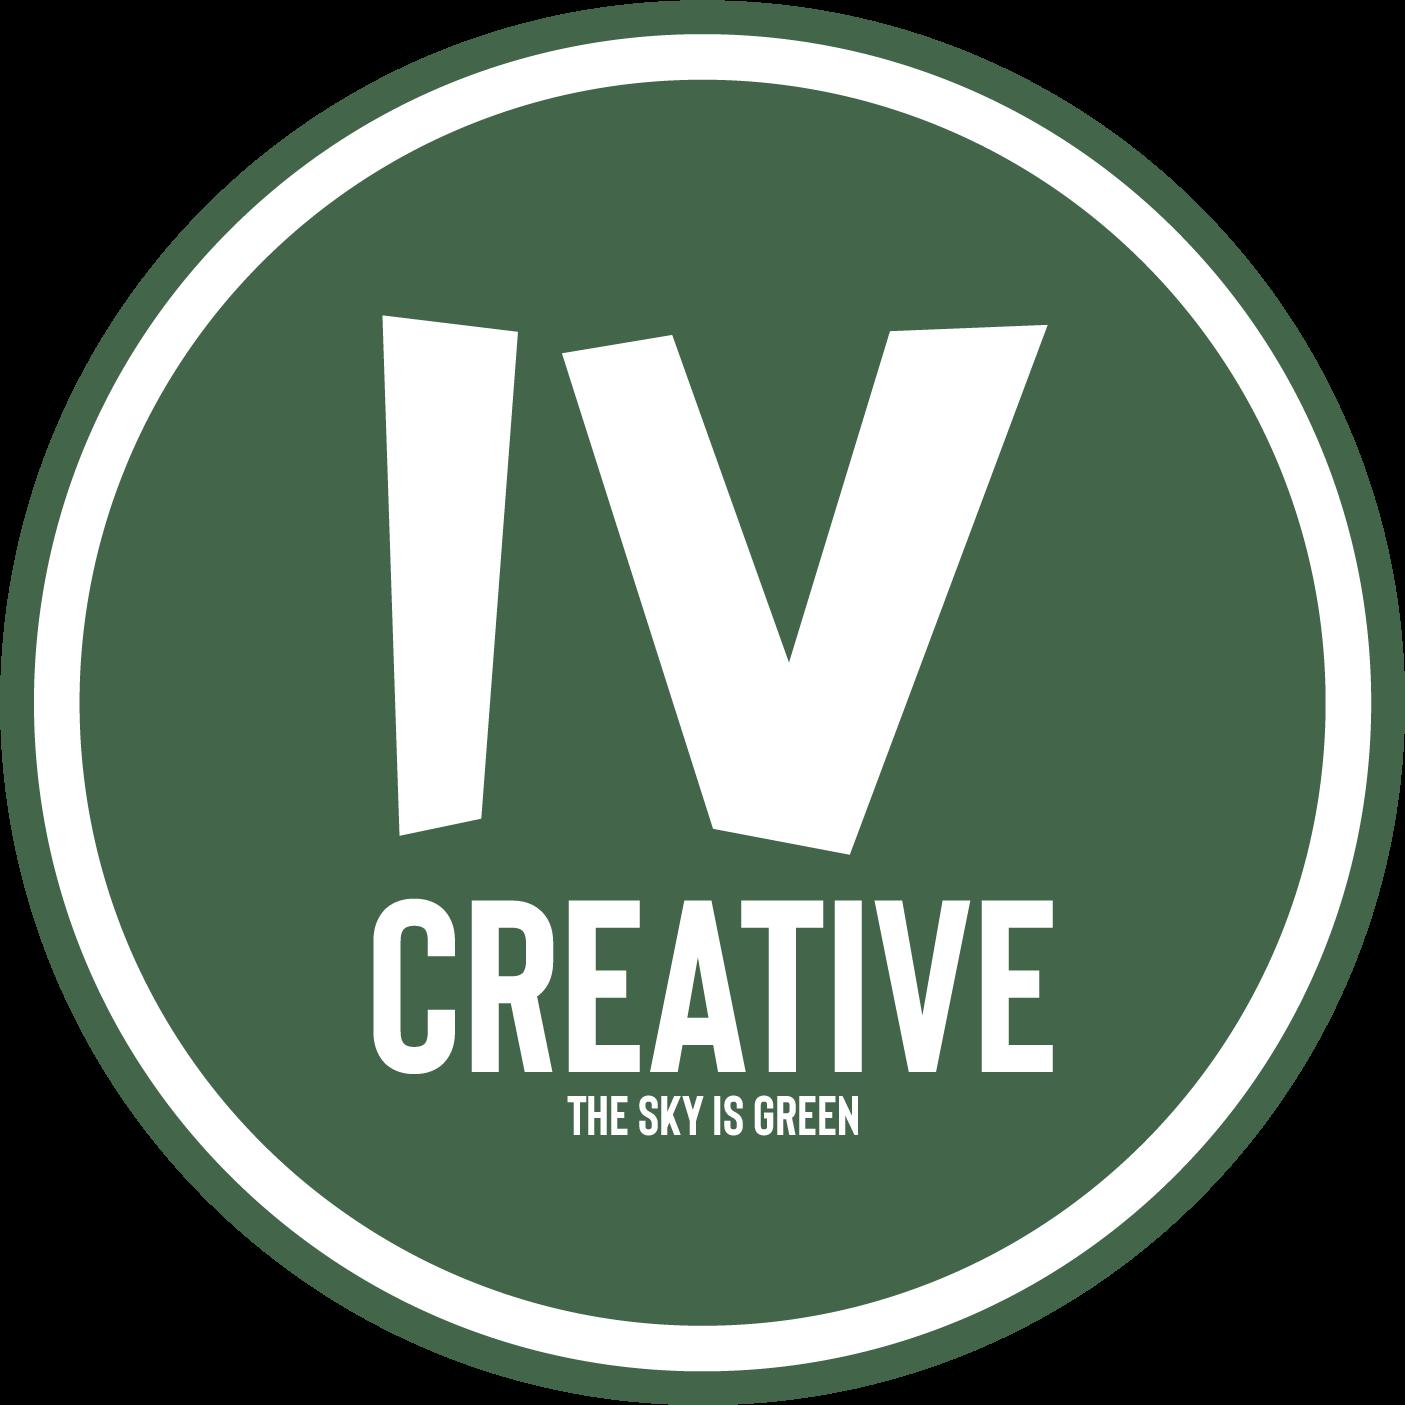 IV Creative